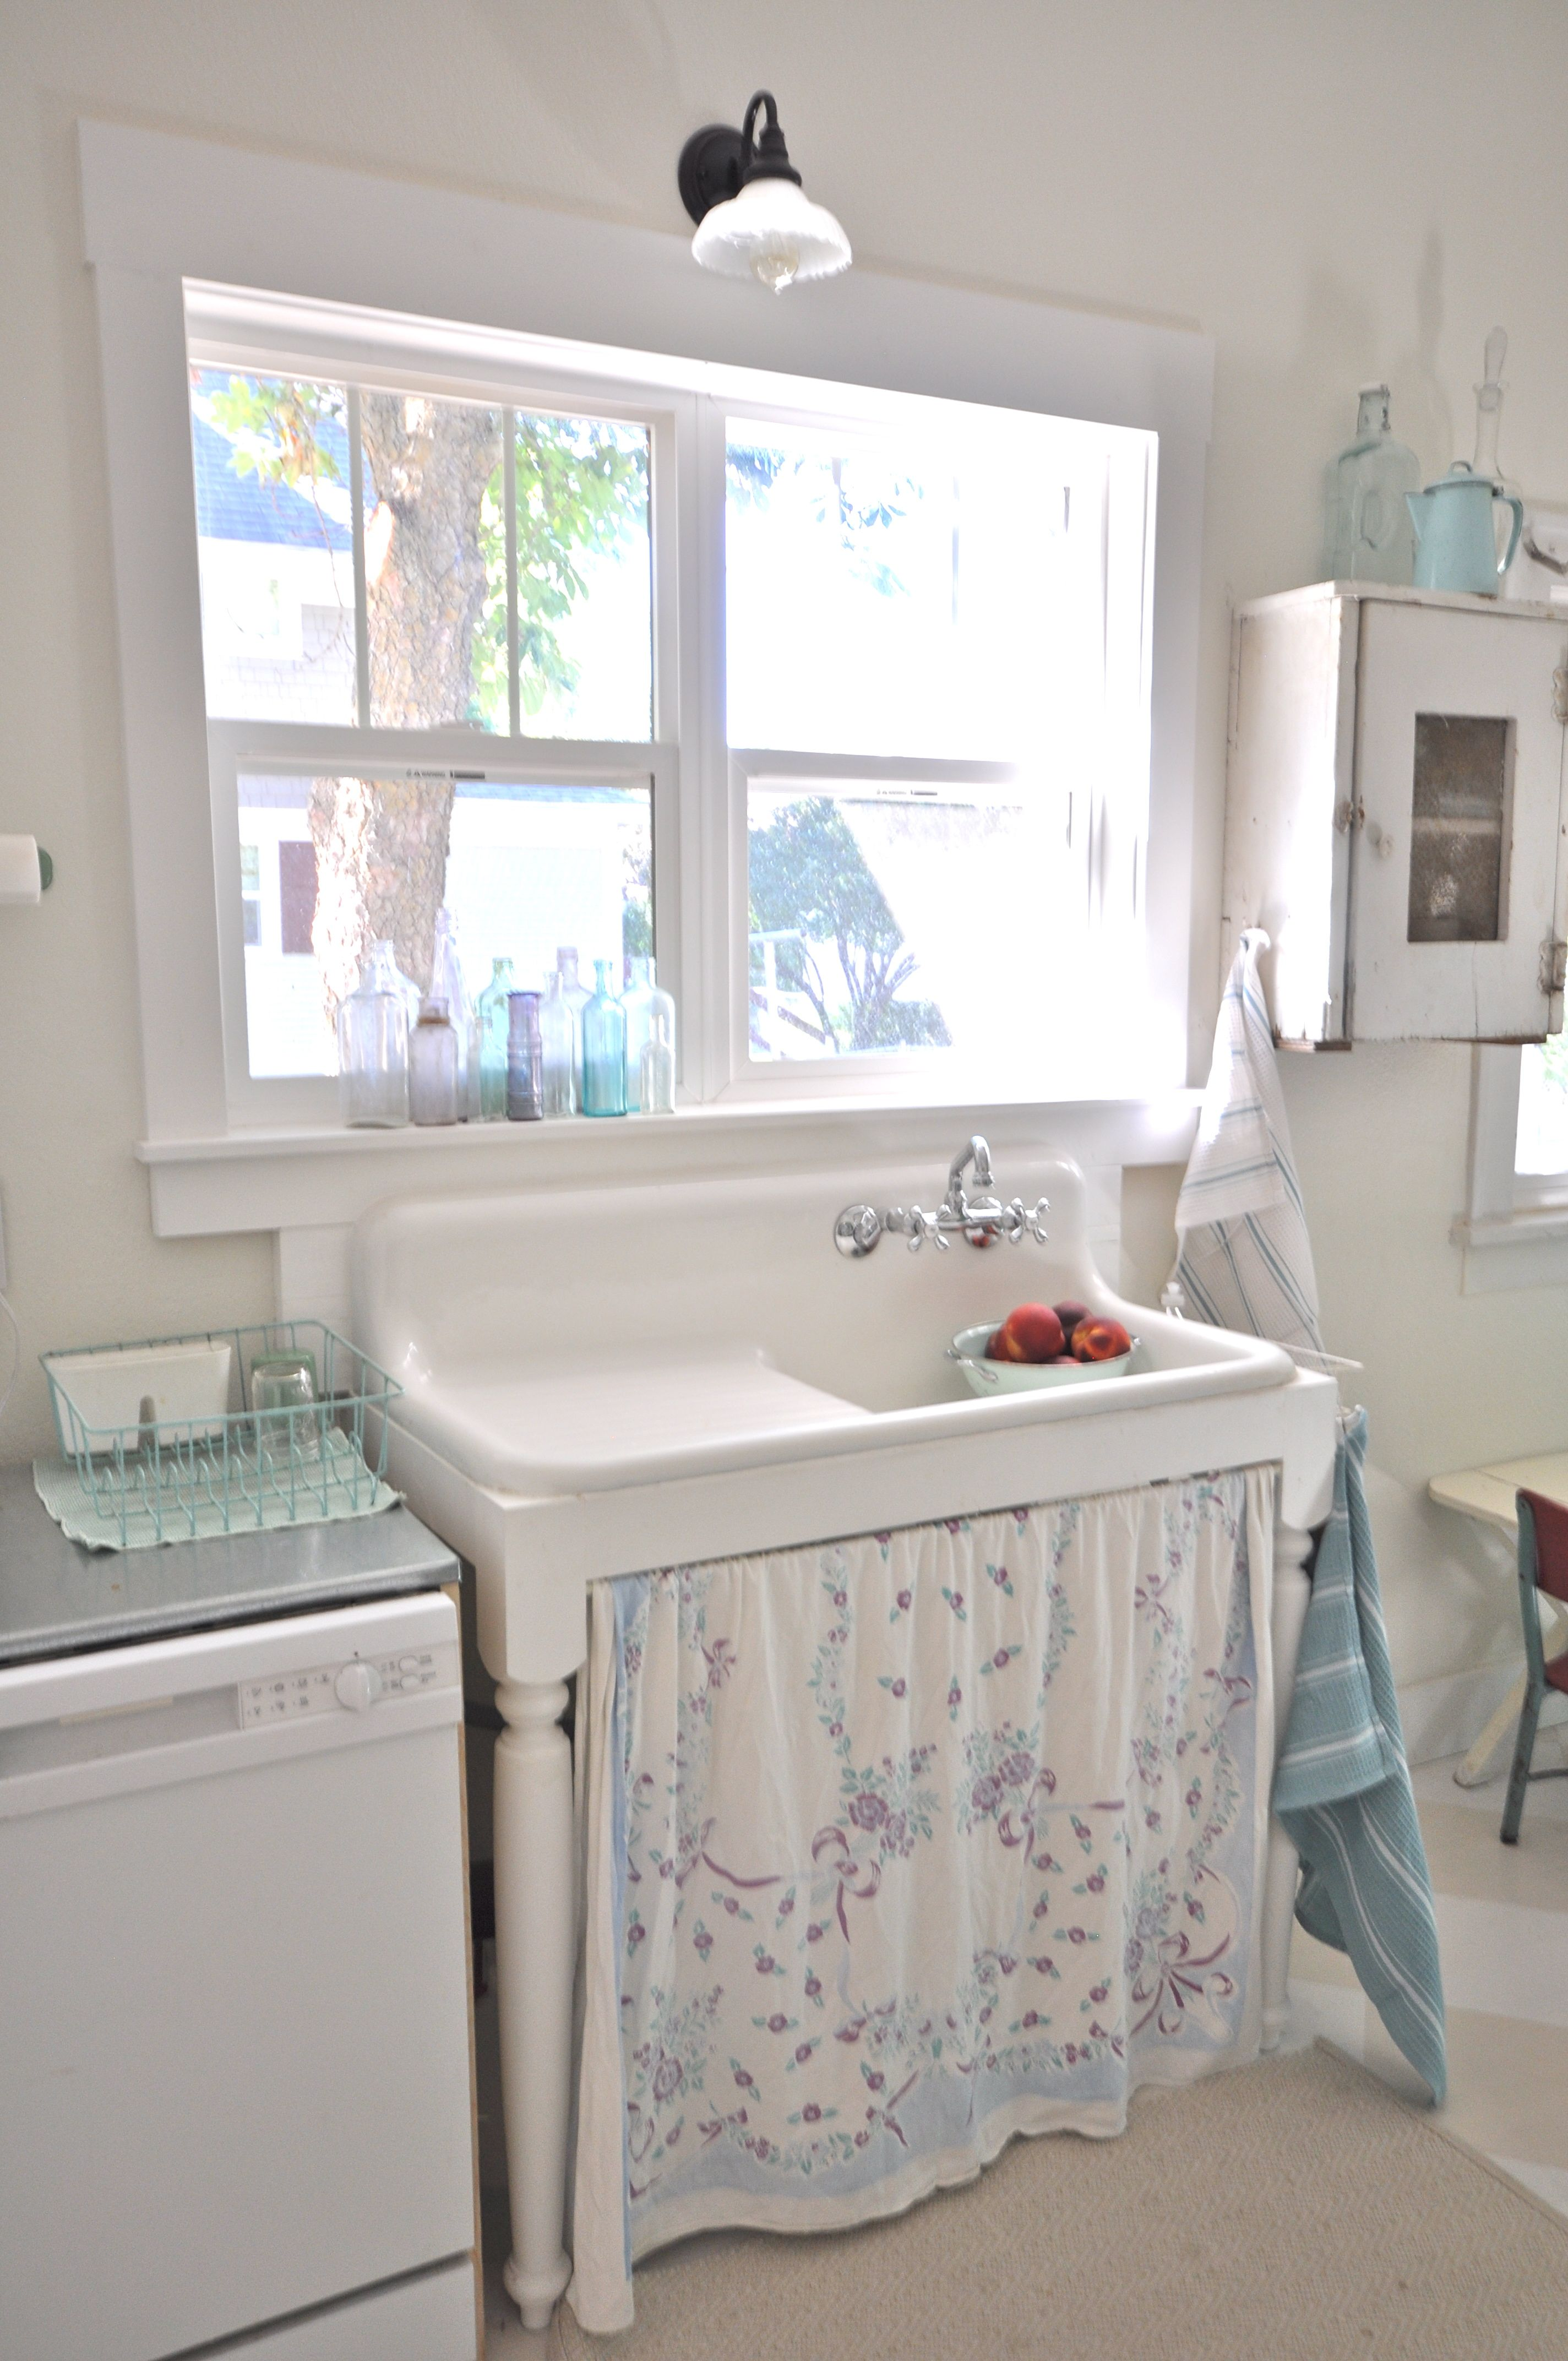 wasbak met gordijntje kitchen pinterest tafelkleden onder